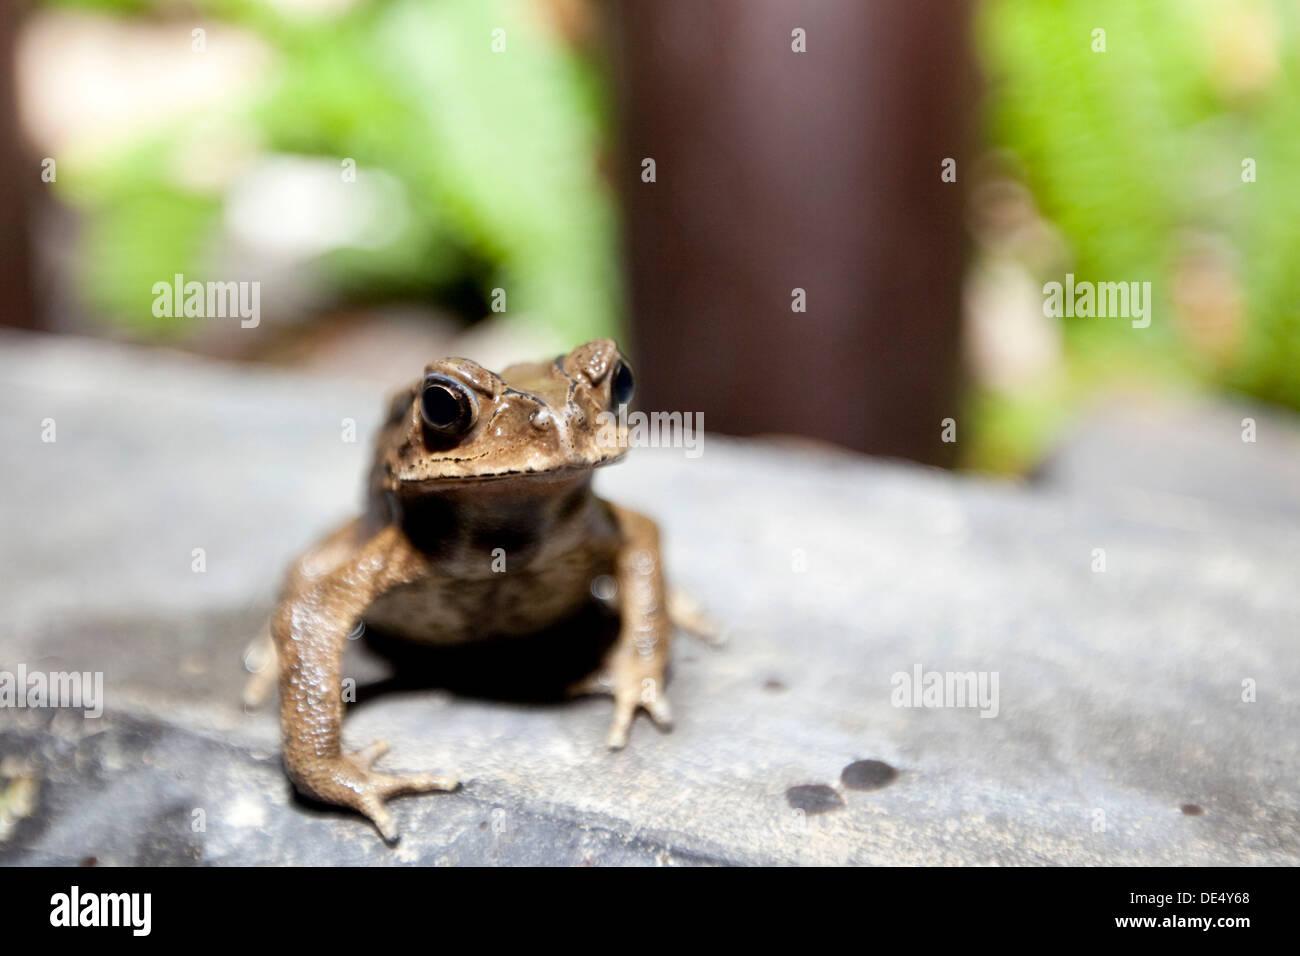 Toad (Bufonidae), Phuket, Thailand, Asia - Stock Image